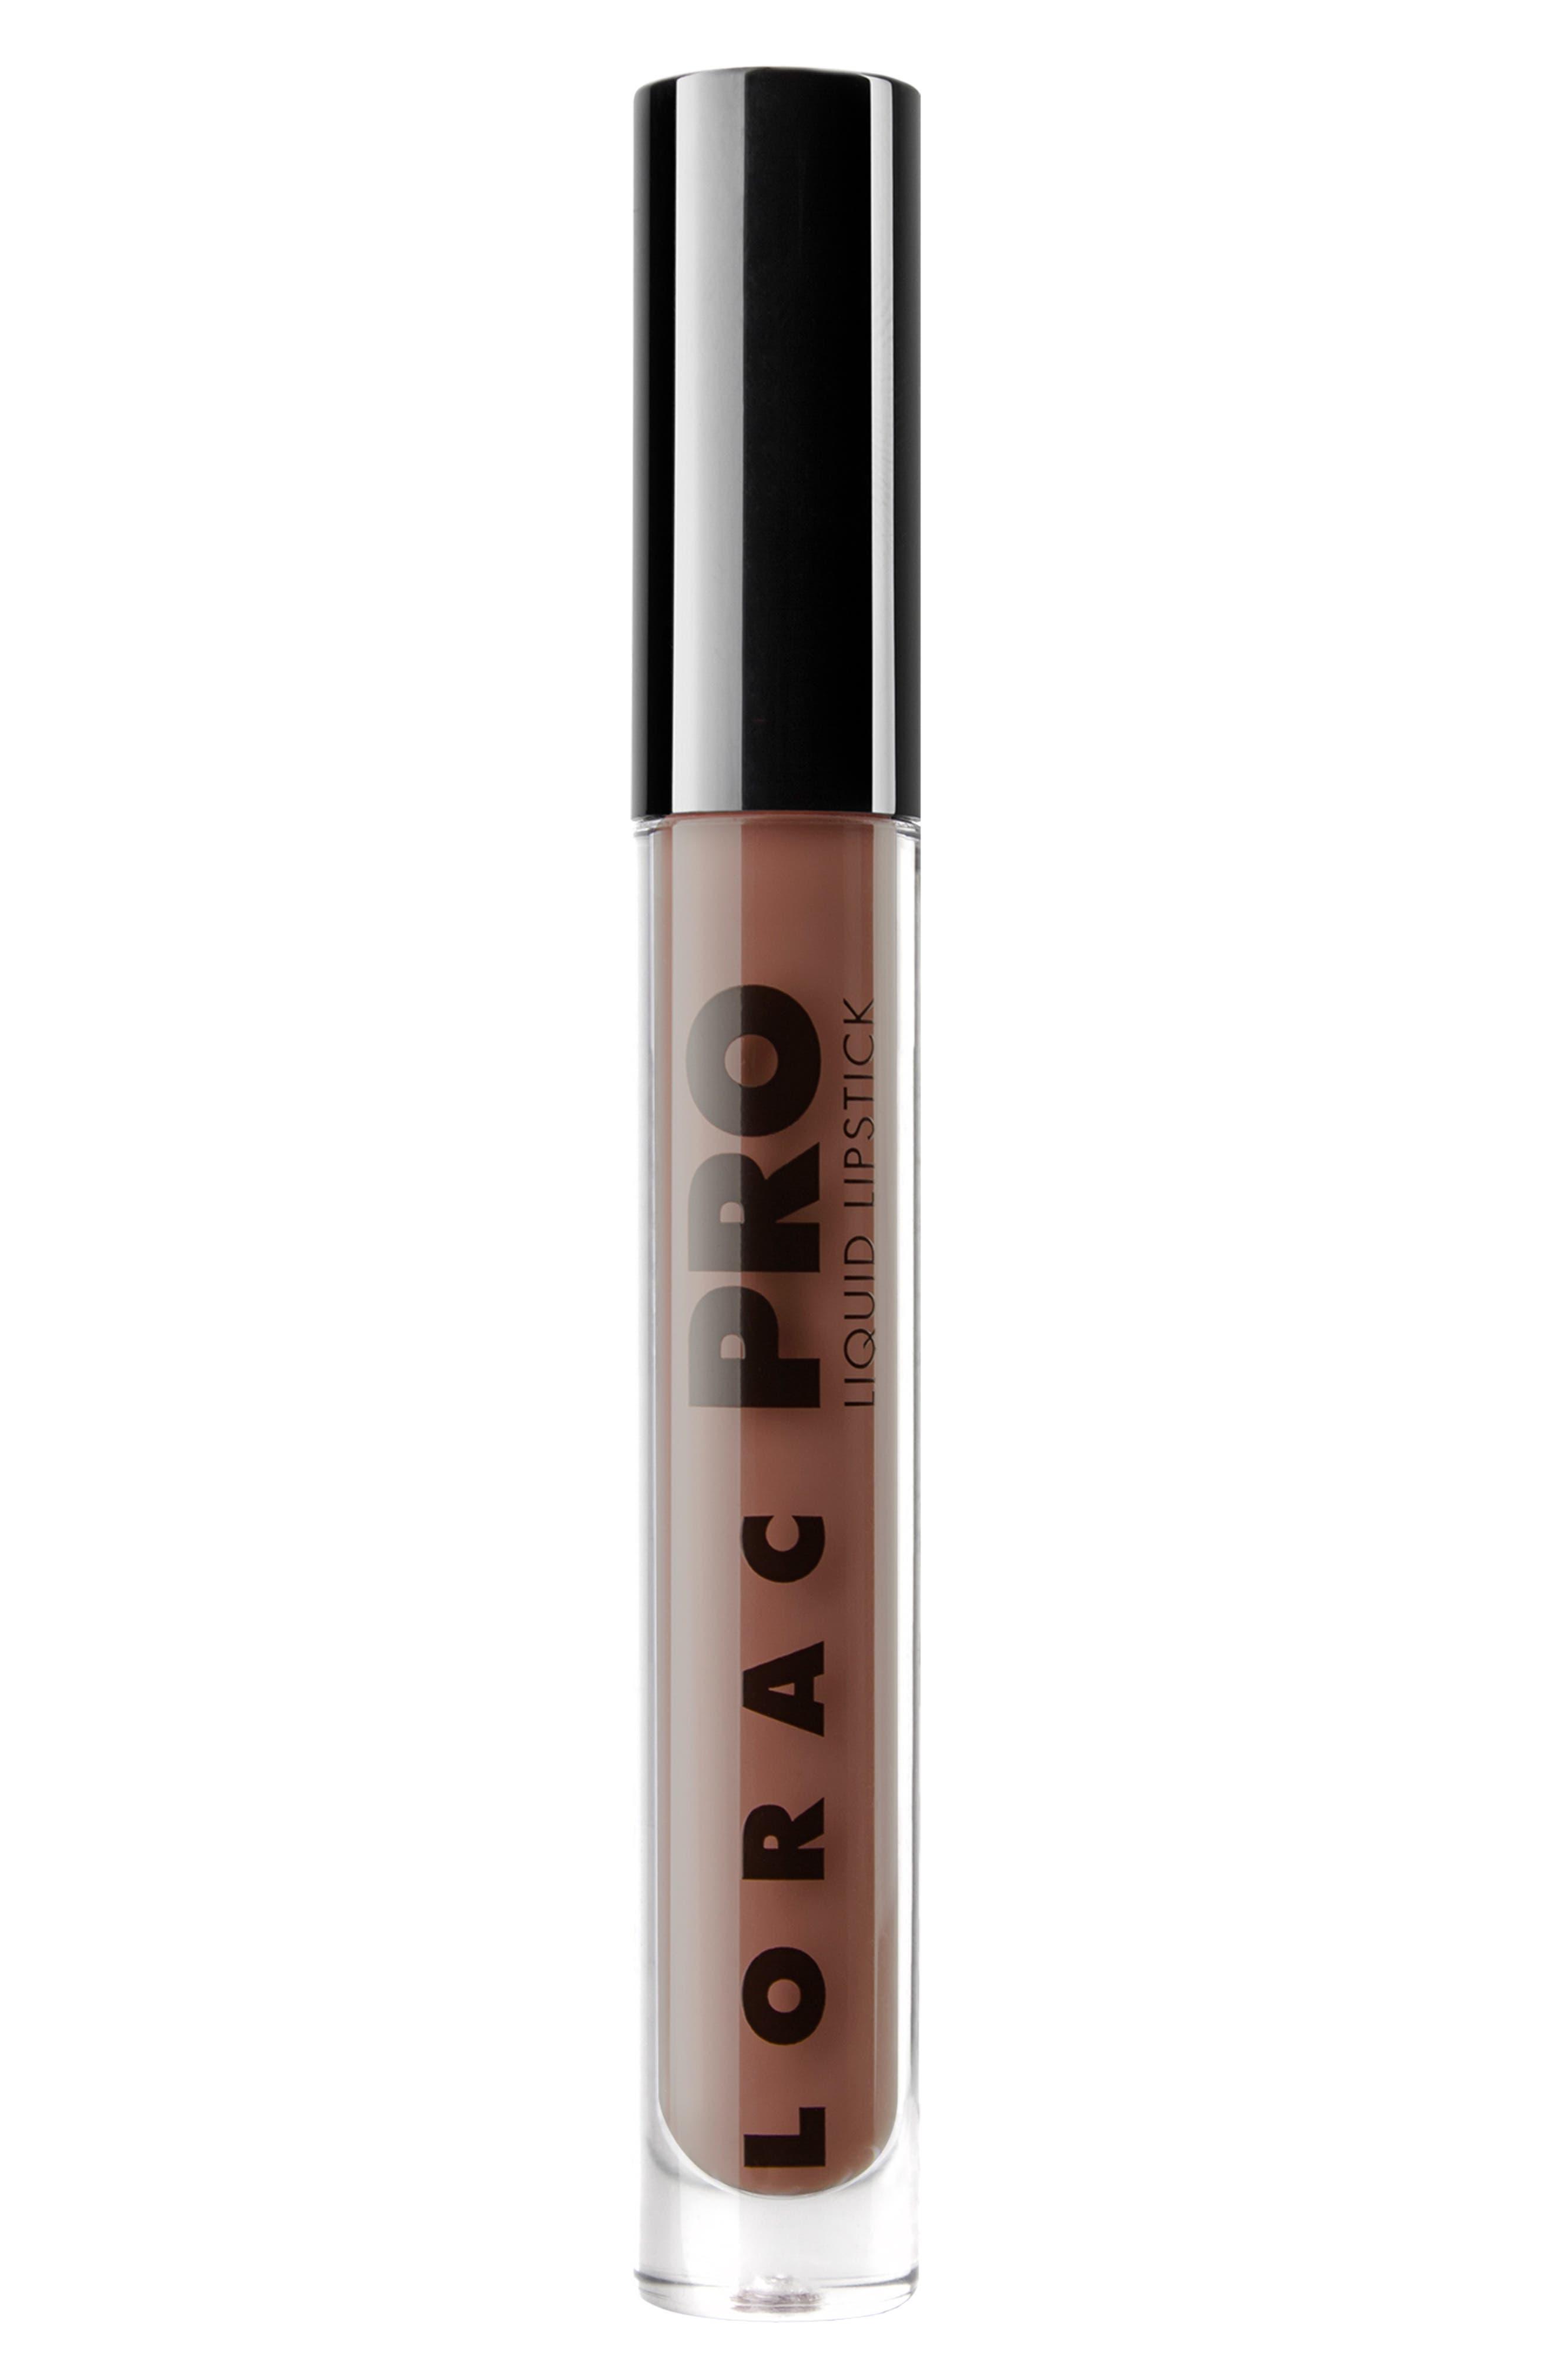 Image of LORAC Liquid Lipstick - Saddle